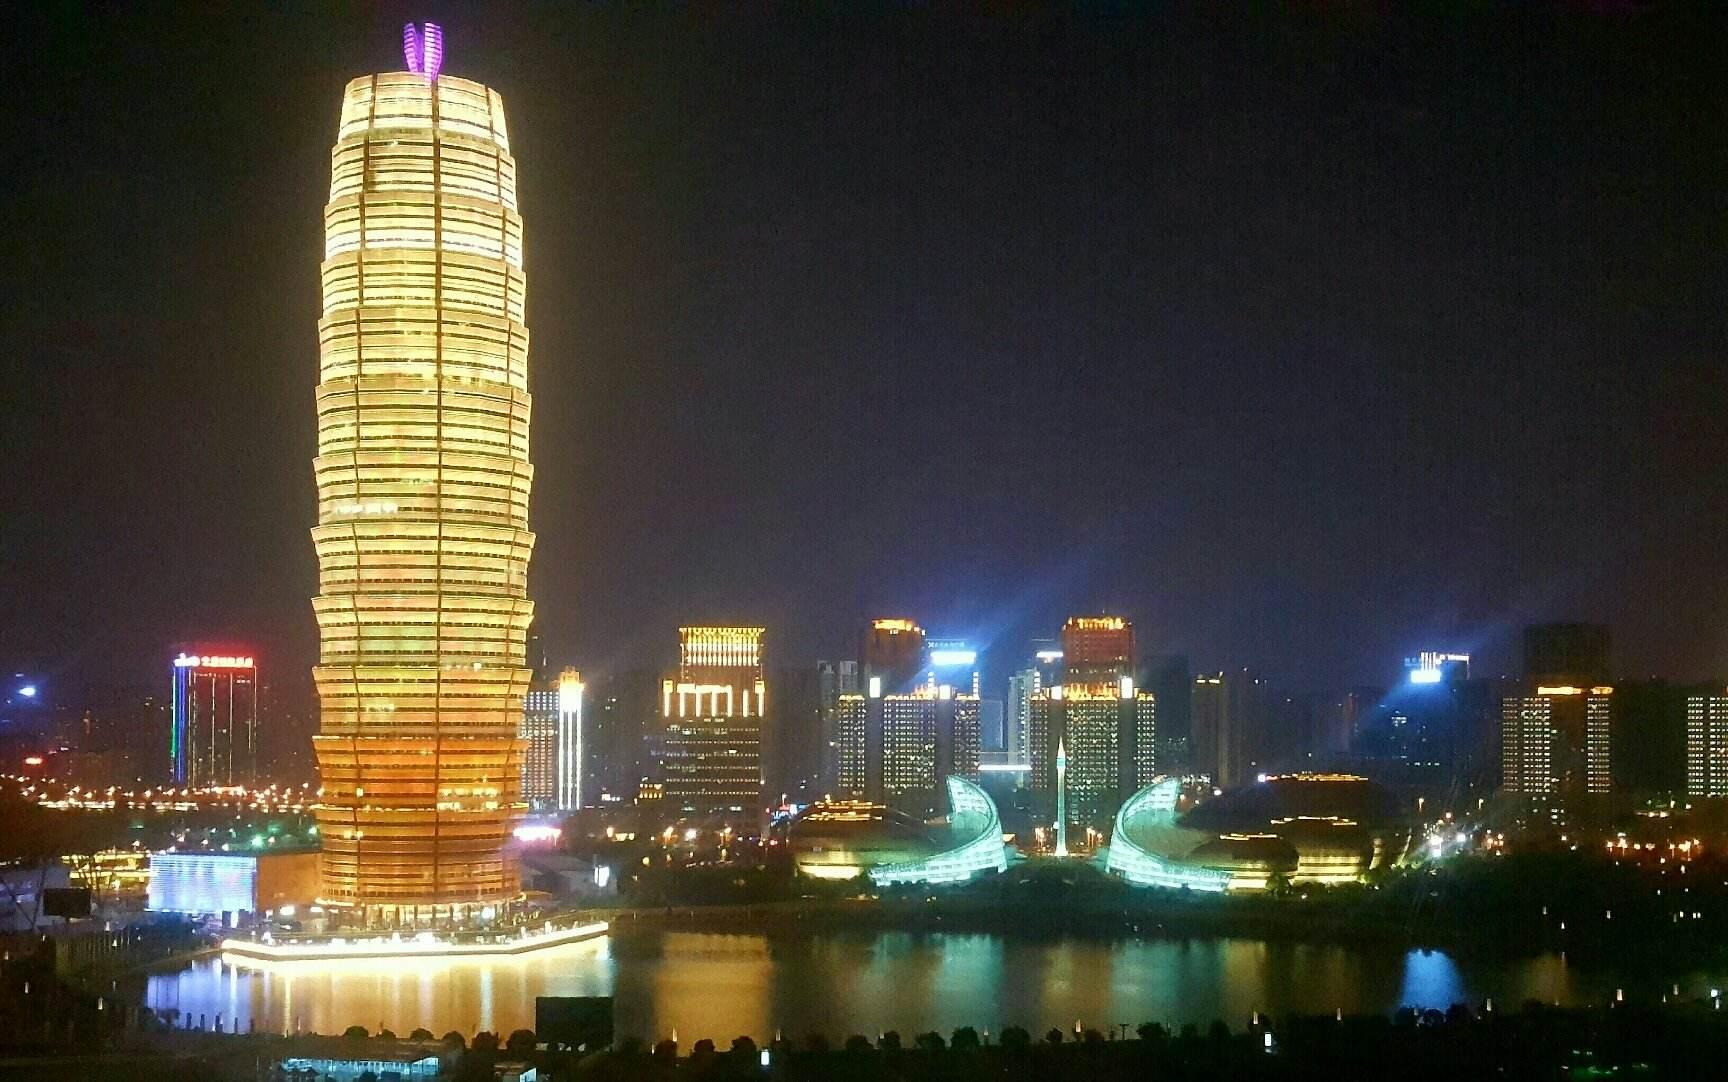 gdp32_中国最小的城市仅32平方公里人均GDP高达8.6万美元